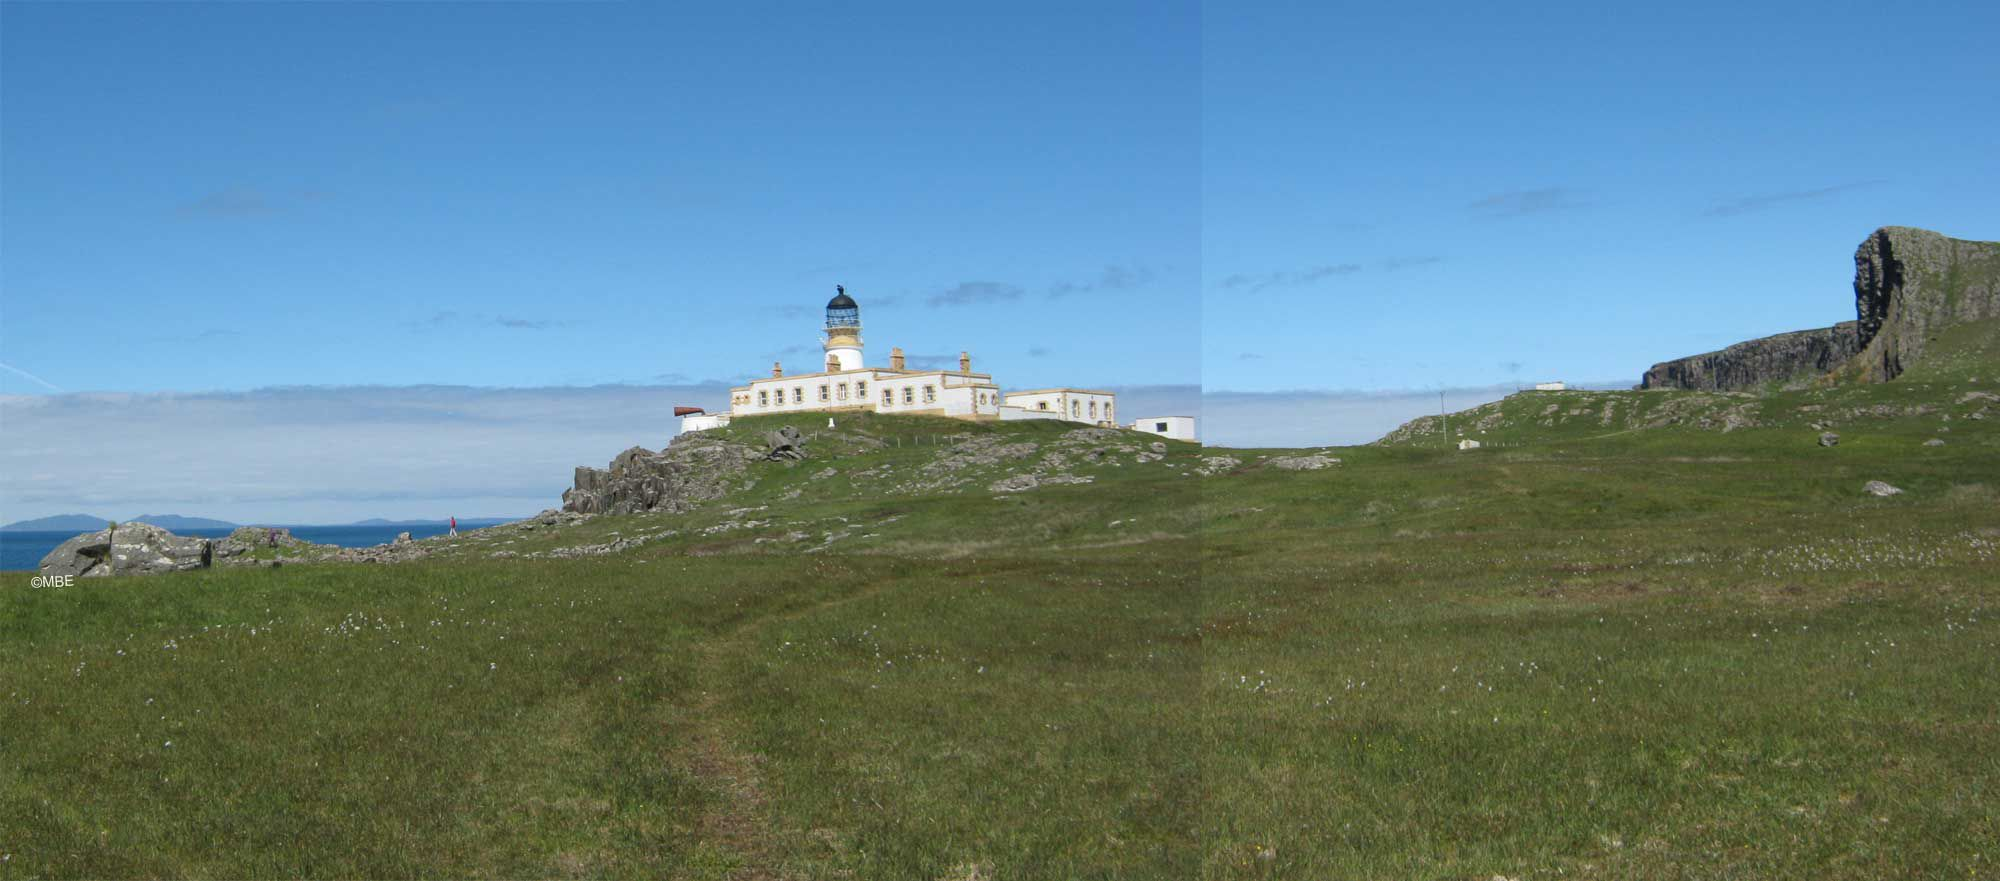 Neist Point Lighthouse, Isle of Skye, landscape photograph taken on a sunny day with a blue sky.